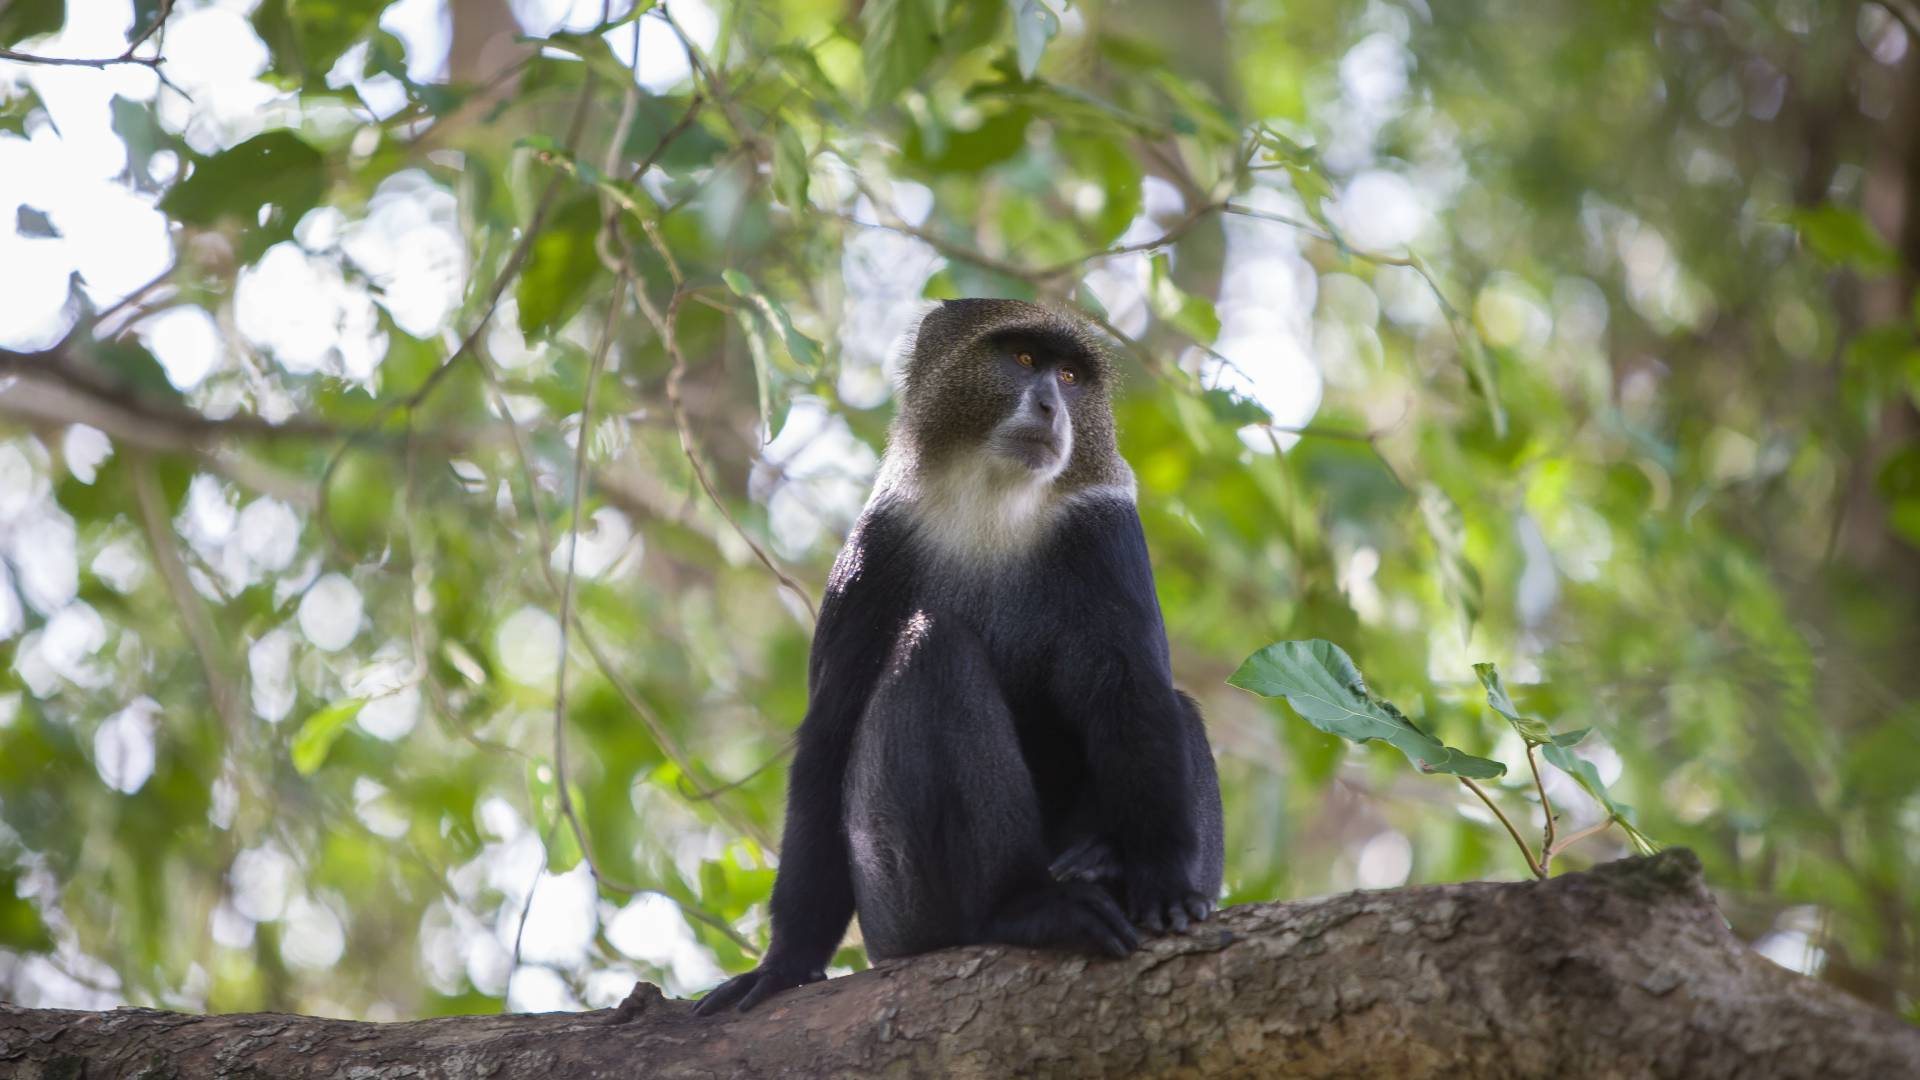 Colubus monkey rivertrees